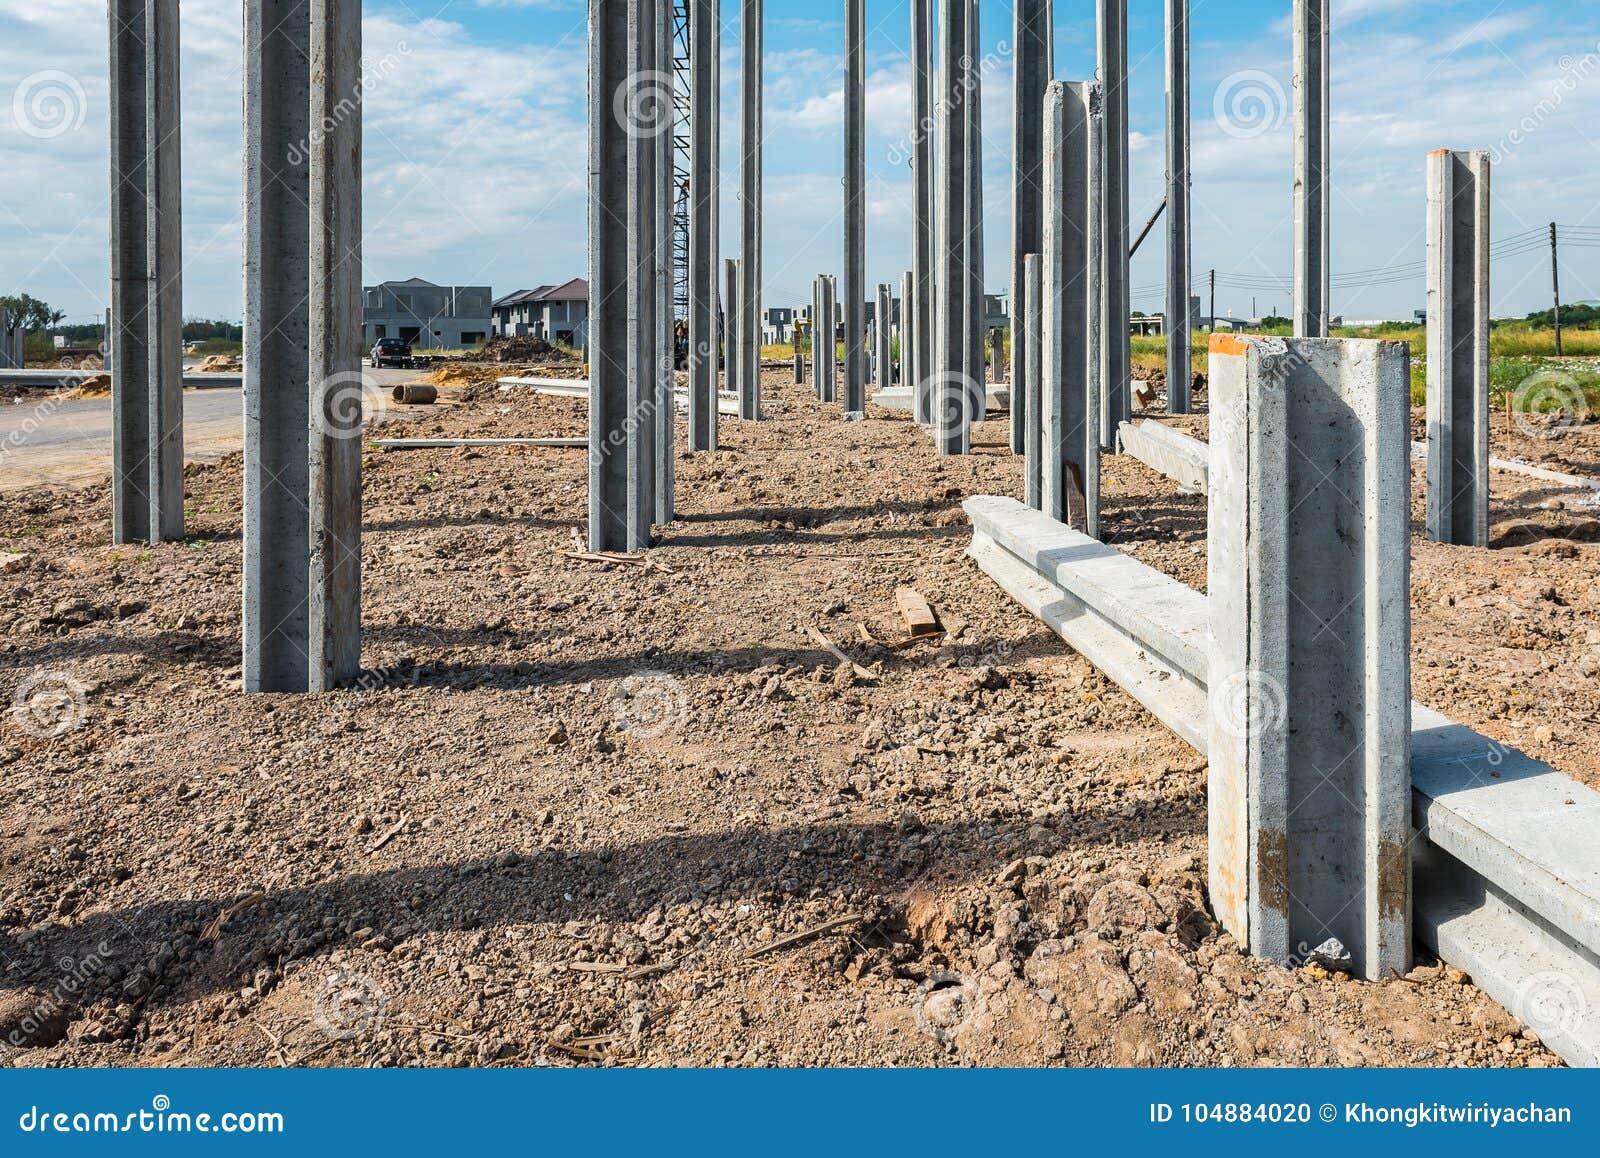 Construction Site With Precast Concrete Pile Stock Photo - Image of